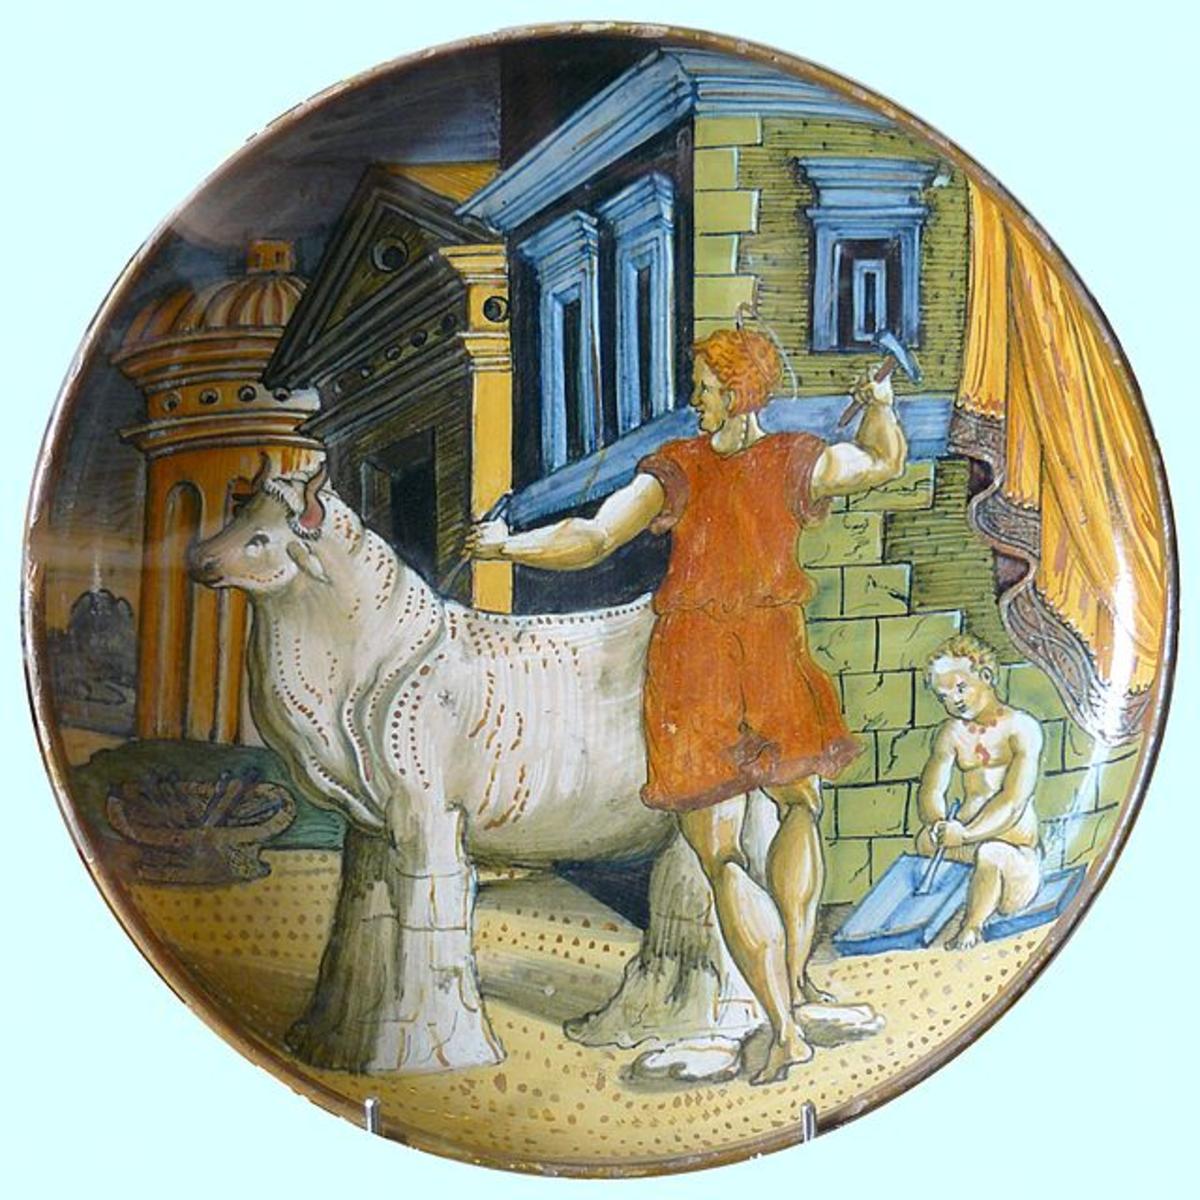 Daedalus assisting Pasiphae